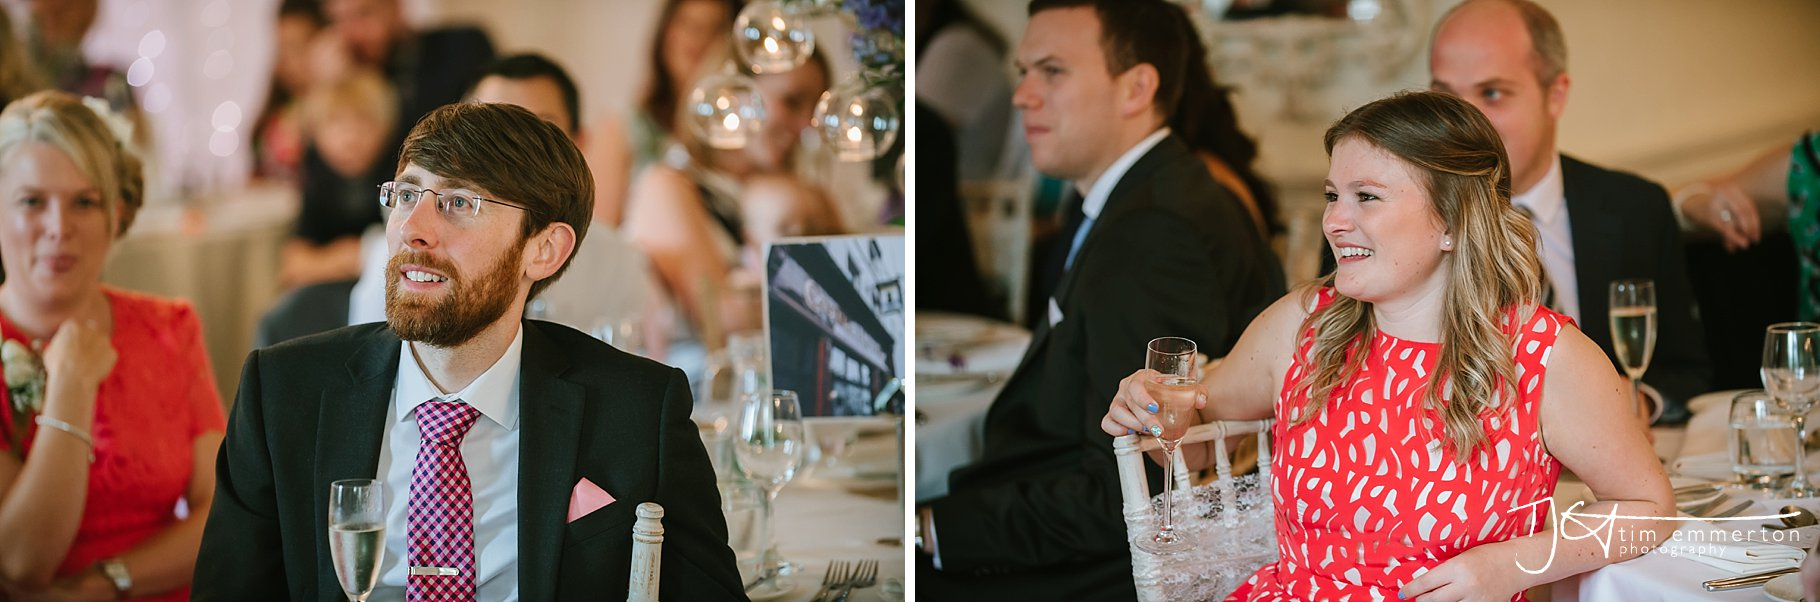 Eaves-Hall-Wedding-Photographer-111.jpg